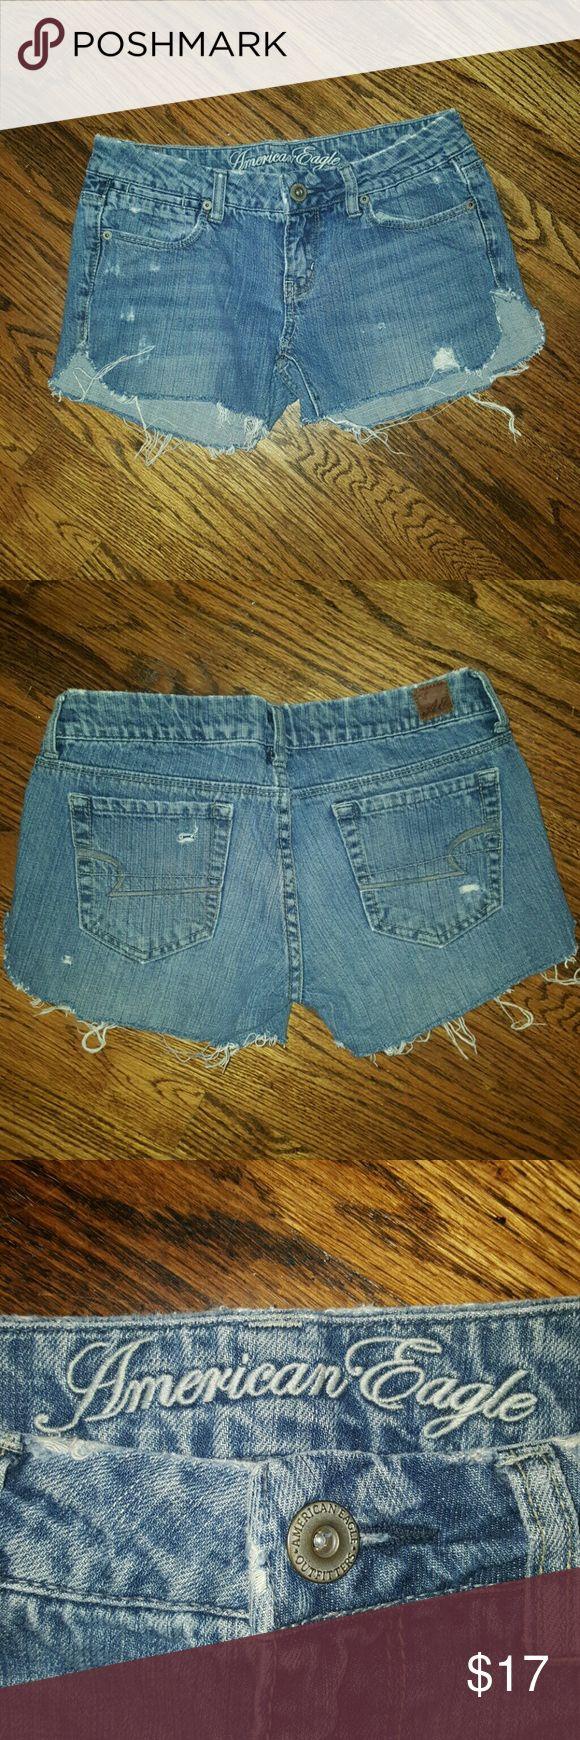 American Eagle Distressed Cutoff Jean Shorts American Eagle Distressed Cutoff Jean Shorts, size 2 American Eagle Outfitters Shorts Jean Shorts